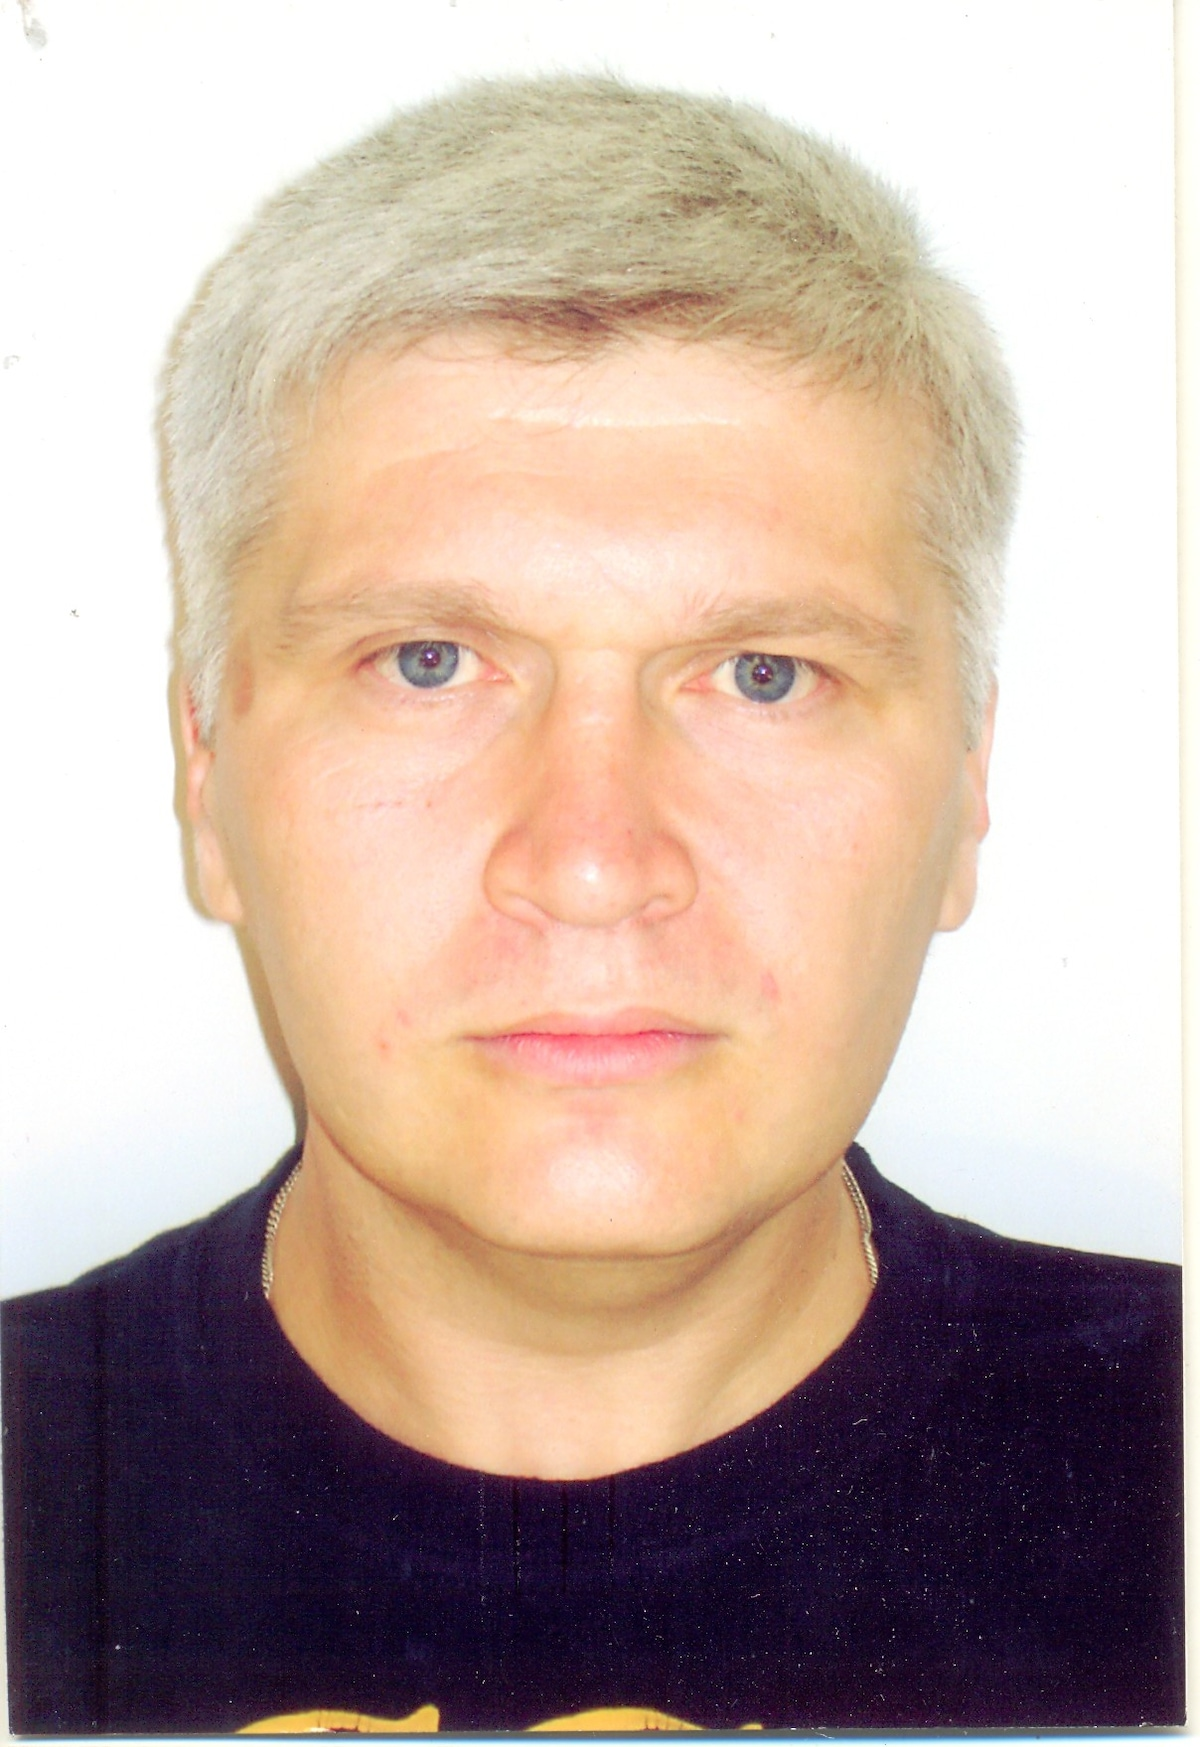 Вячеслав From Donetsk, Ukraine